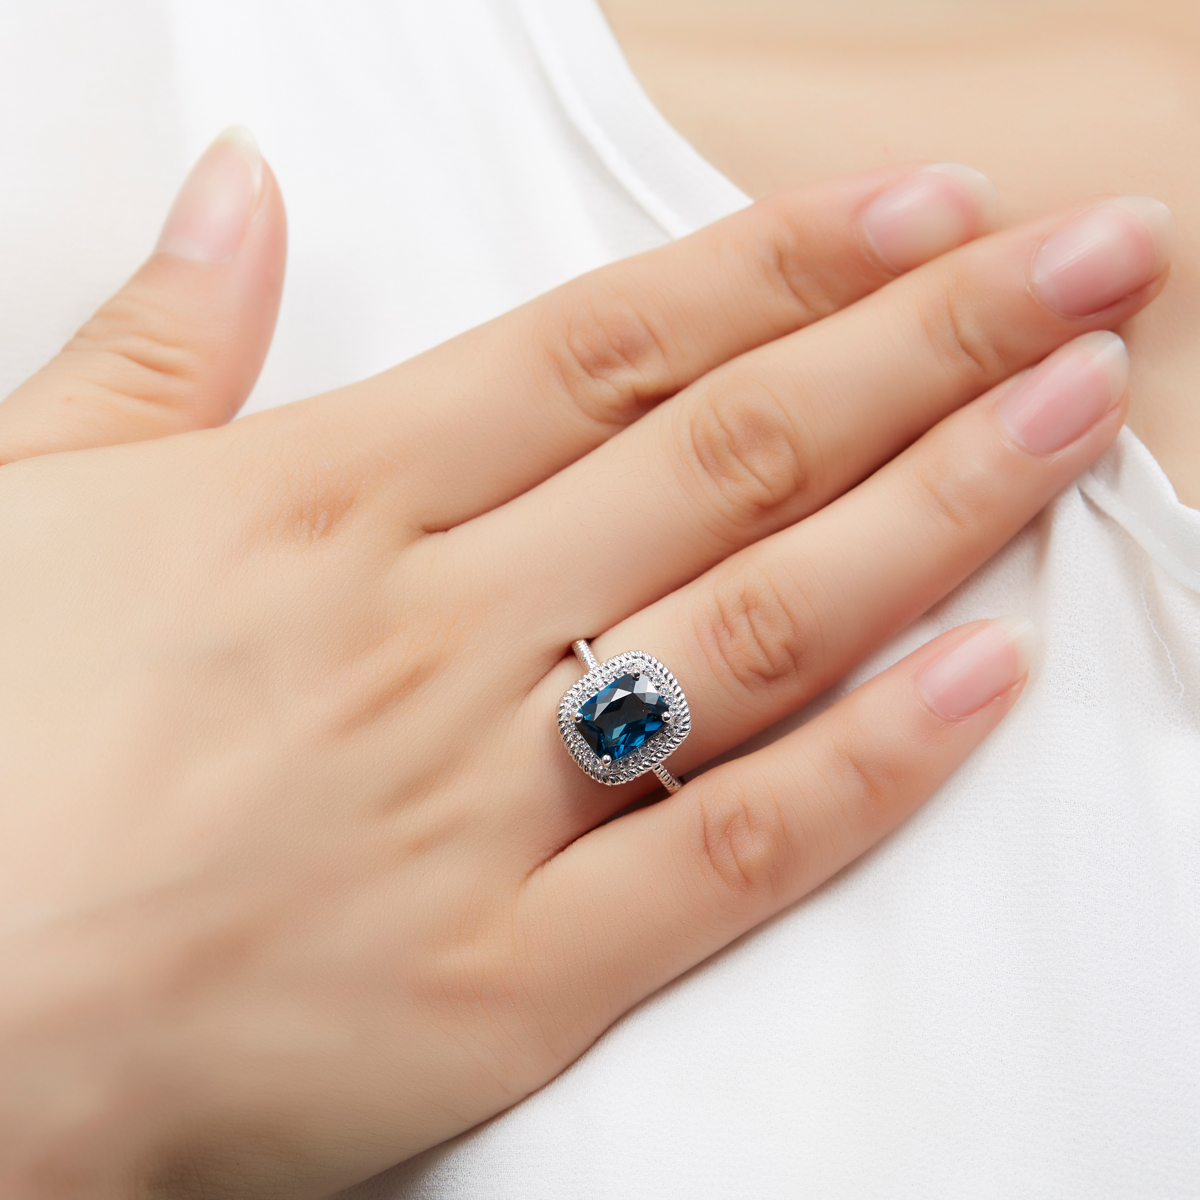 Здесь продается  Hutang Genuine London Blue Topaz Ring Solid 925 Sterling Silver Gemstone Fine Jewelry Women Wedding Party Brand Jewelry  Ювелирные изделия и часы